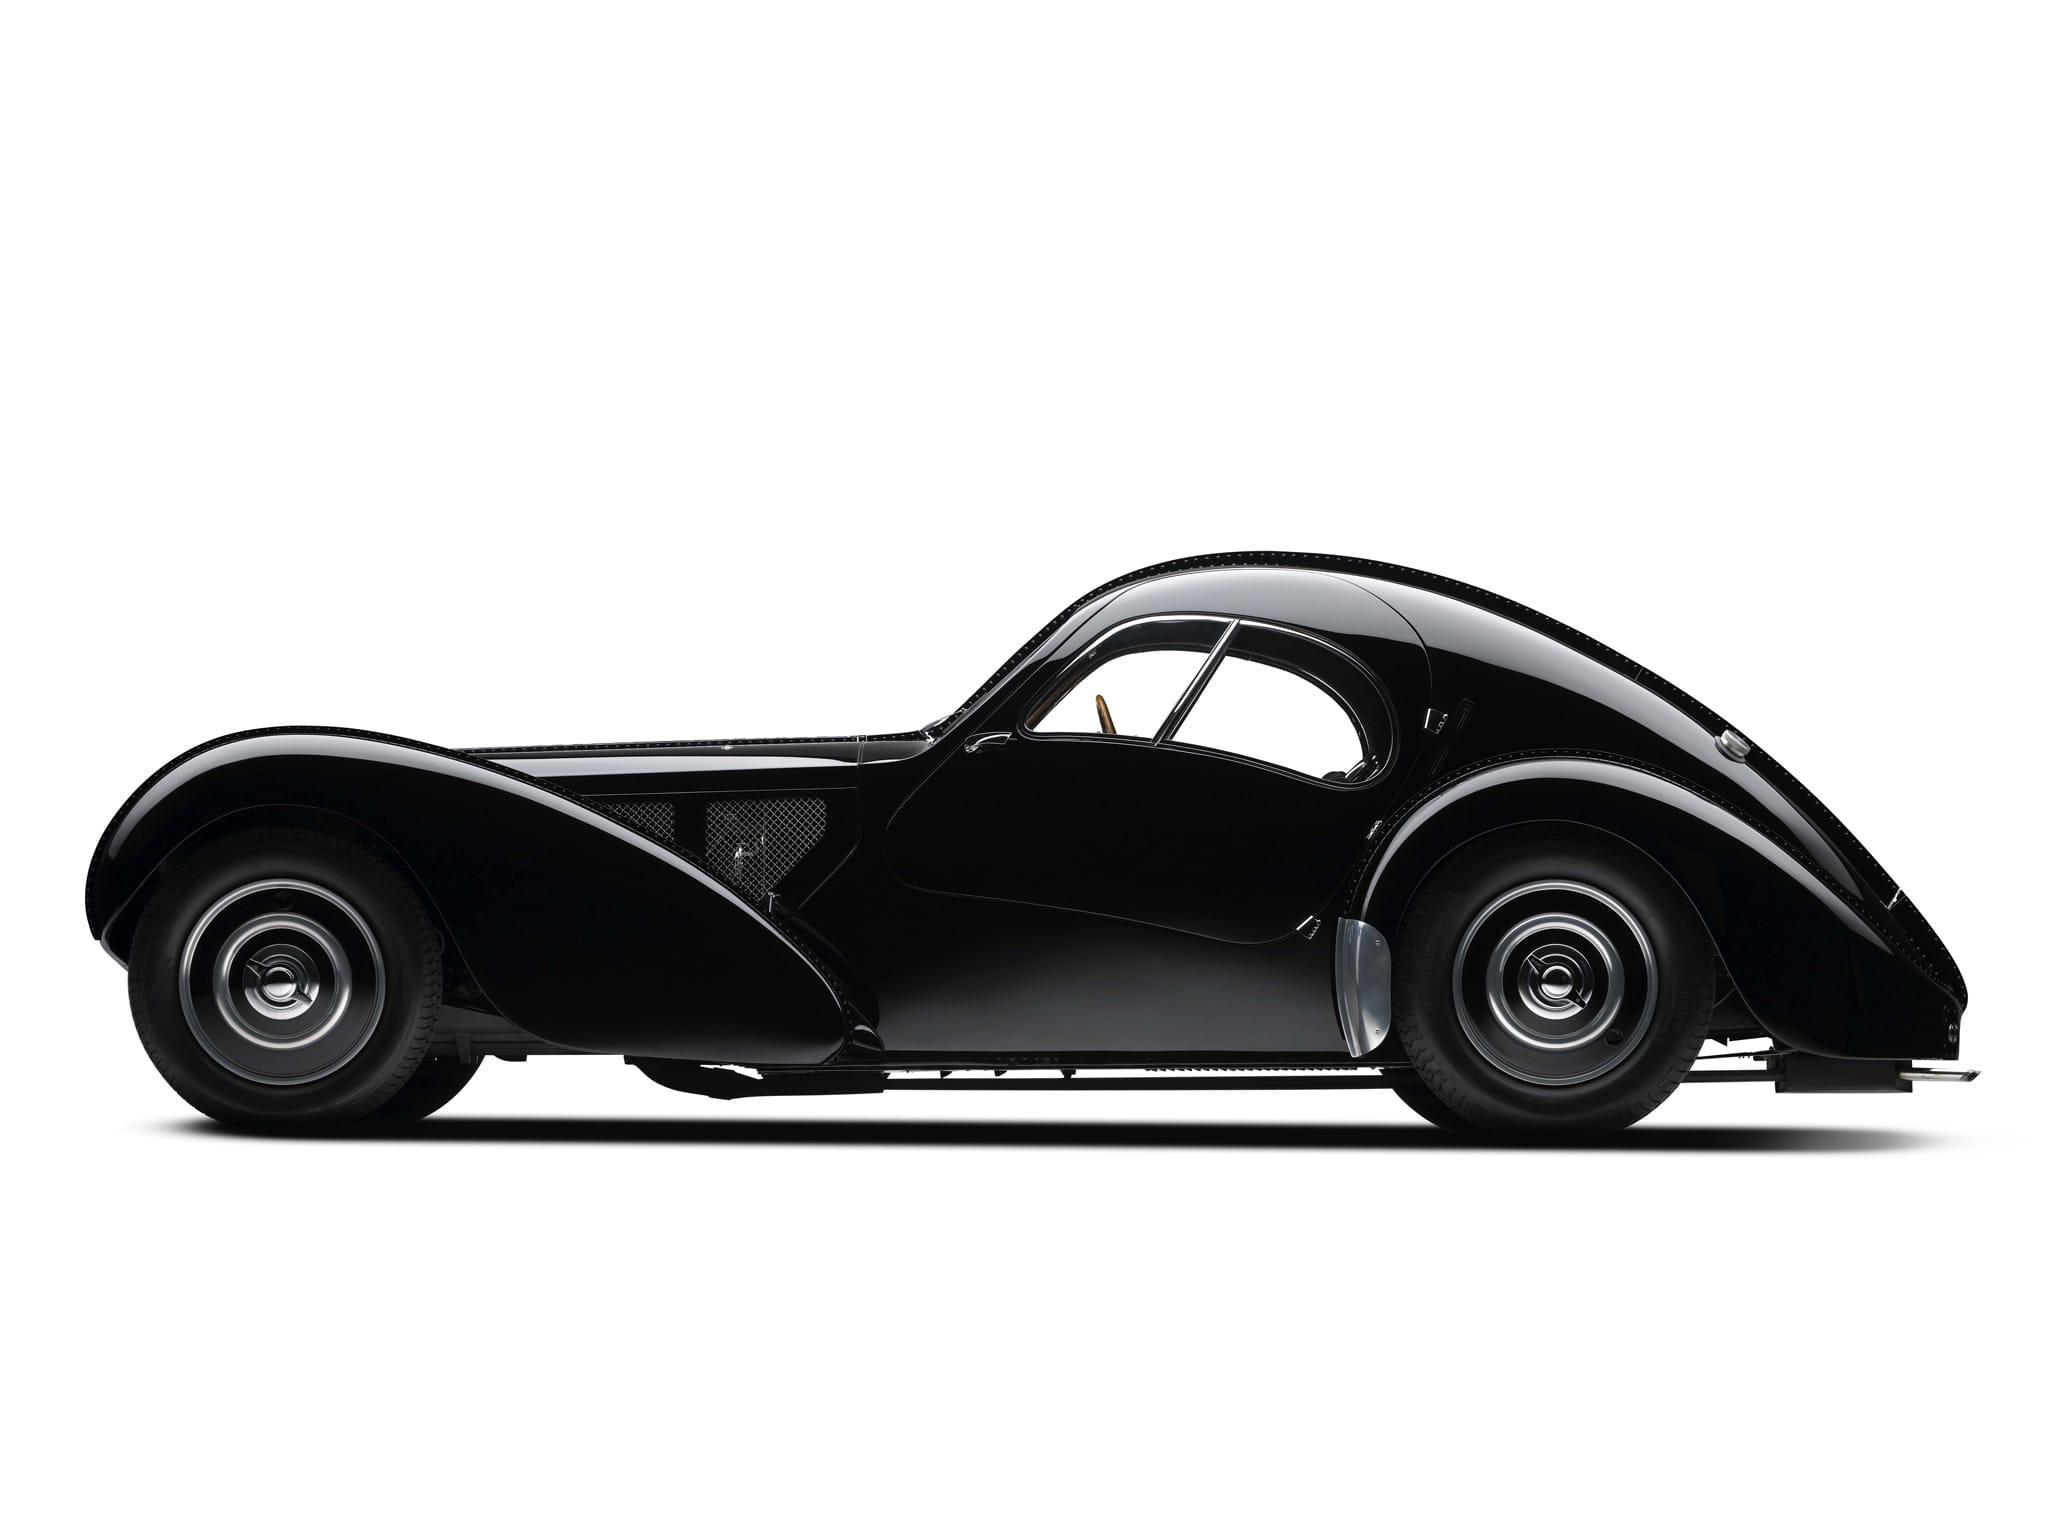 Bugatti Type 57SC Atlantic Coupe widescreen wallpapers